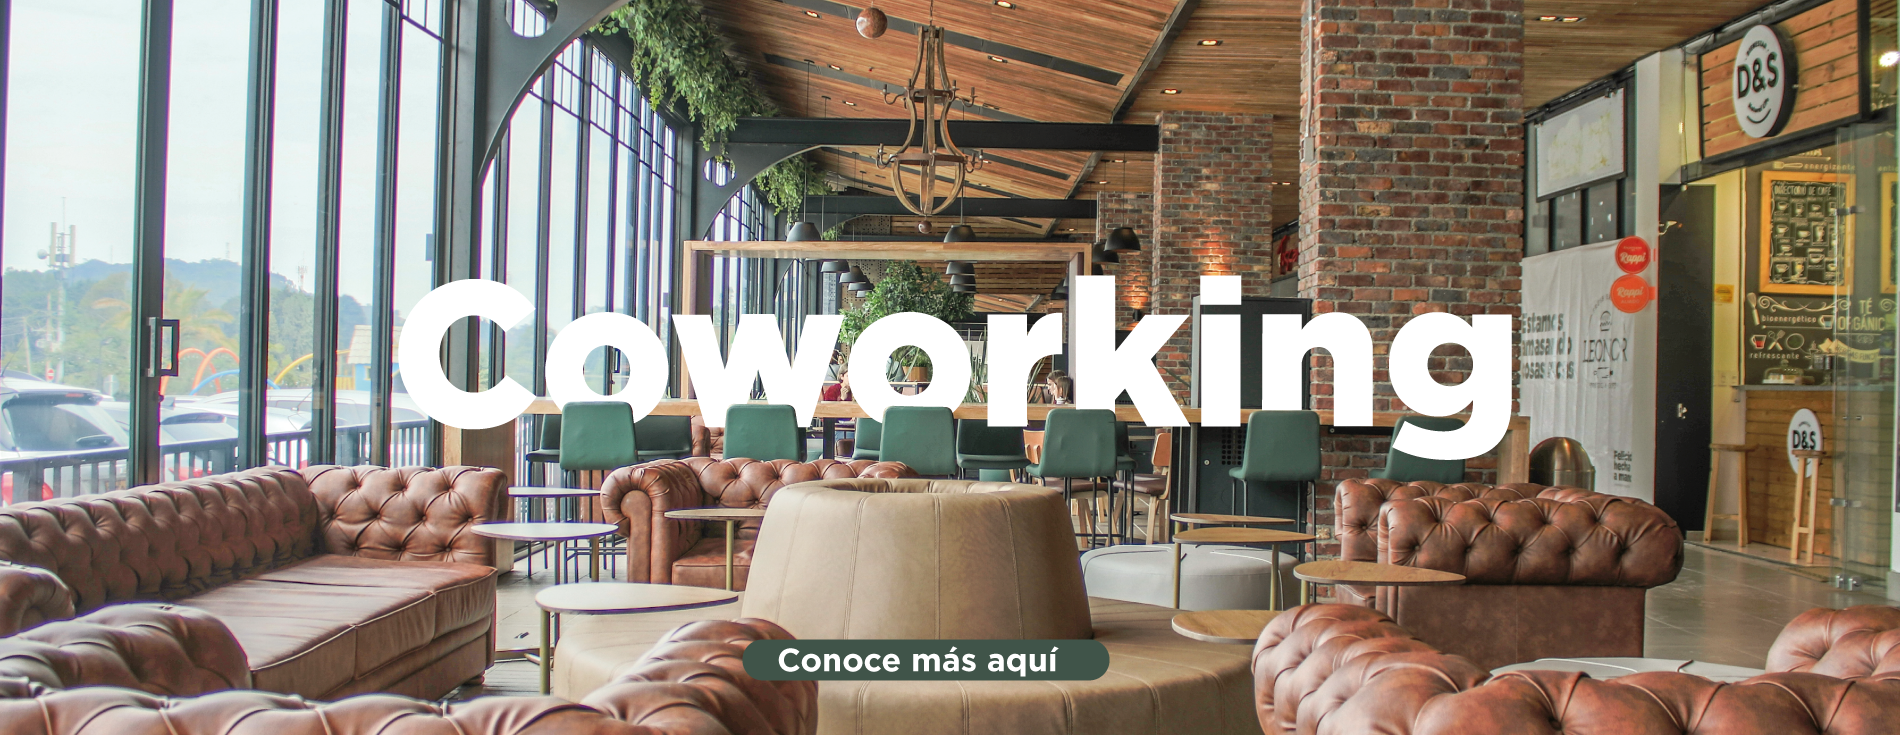 Zona Coworking - Palmas